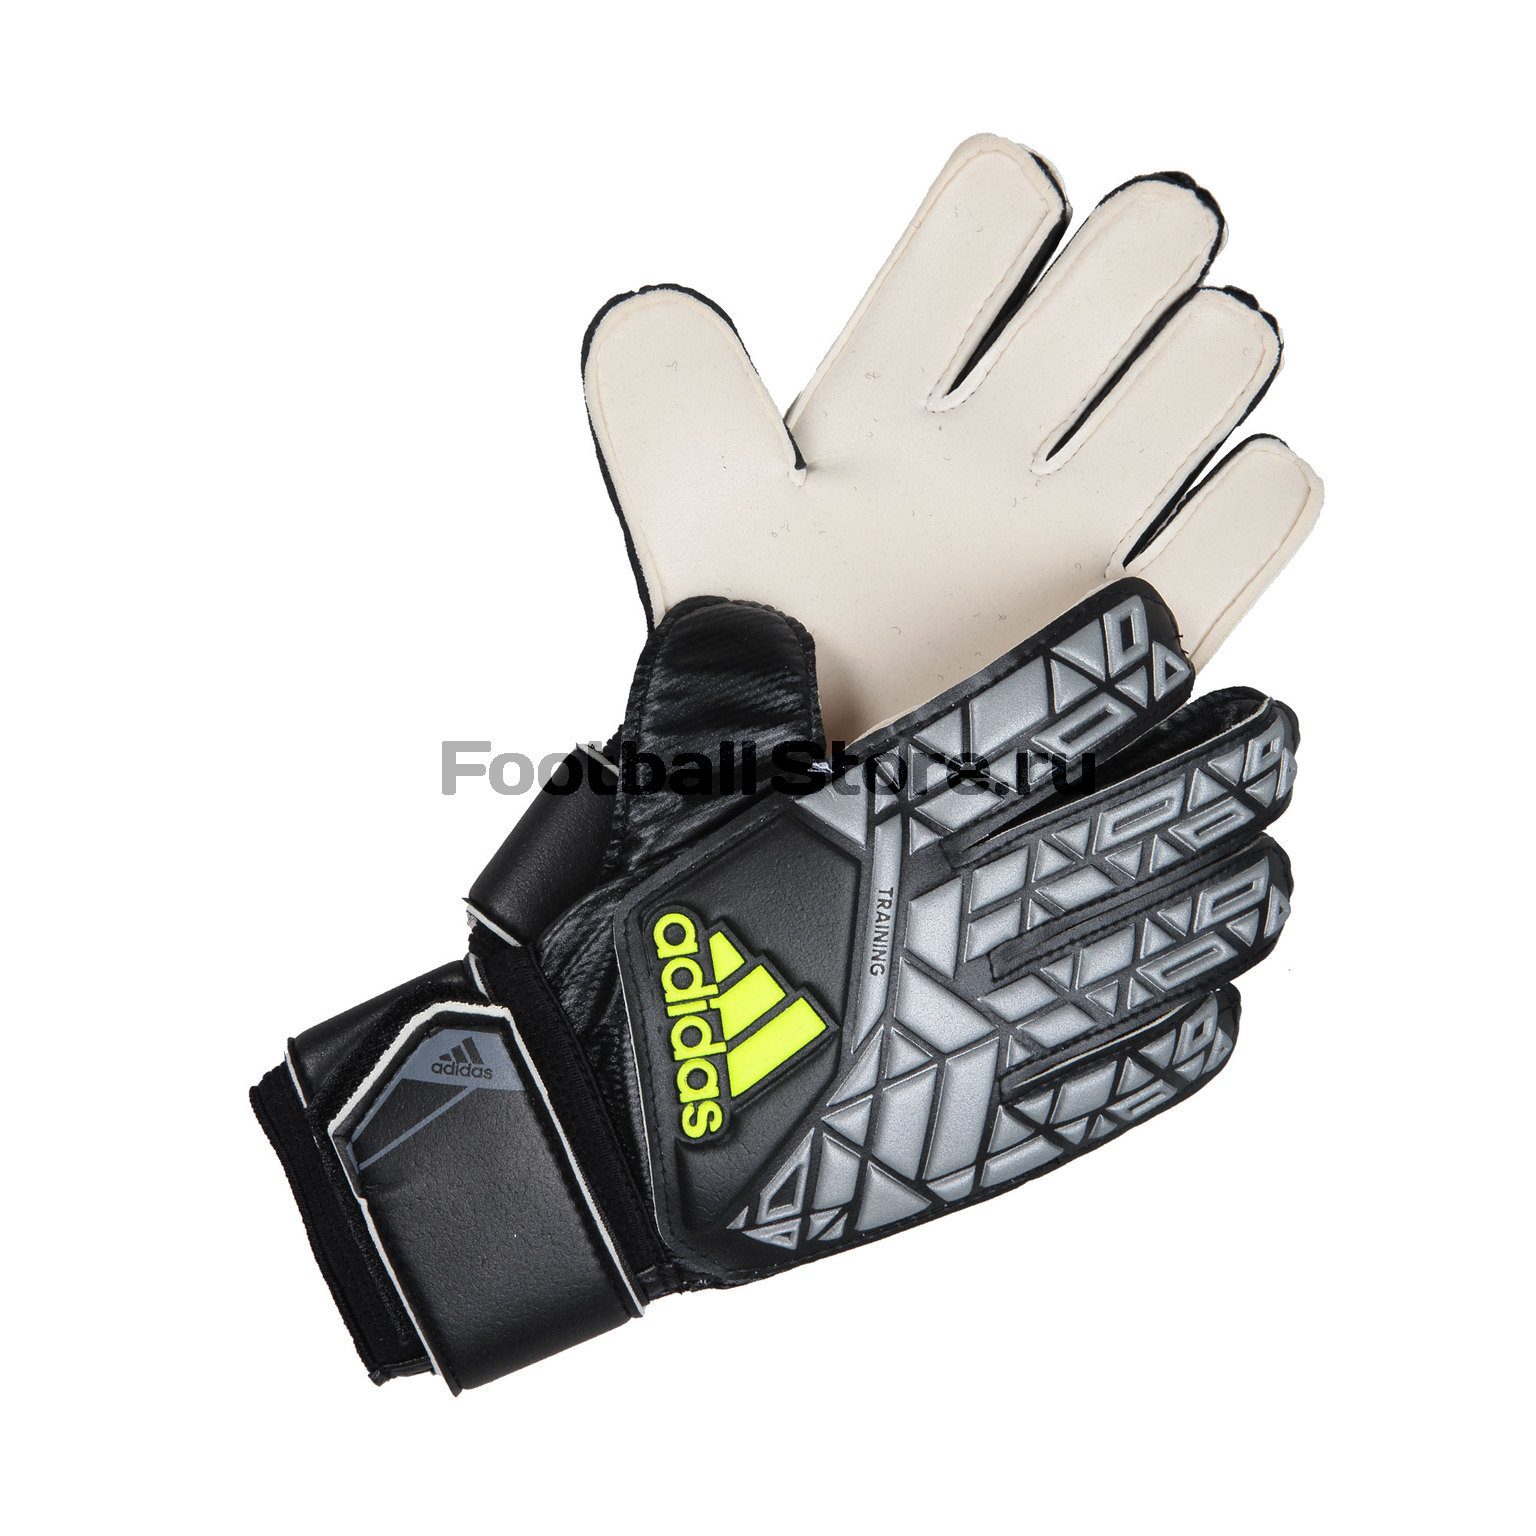 Перчатки Adidas Перчатки вратарские Adidas ACE Training AZ3118 цены онлайн